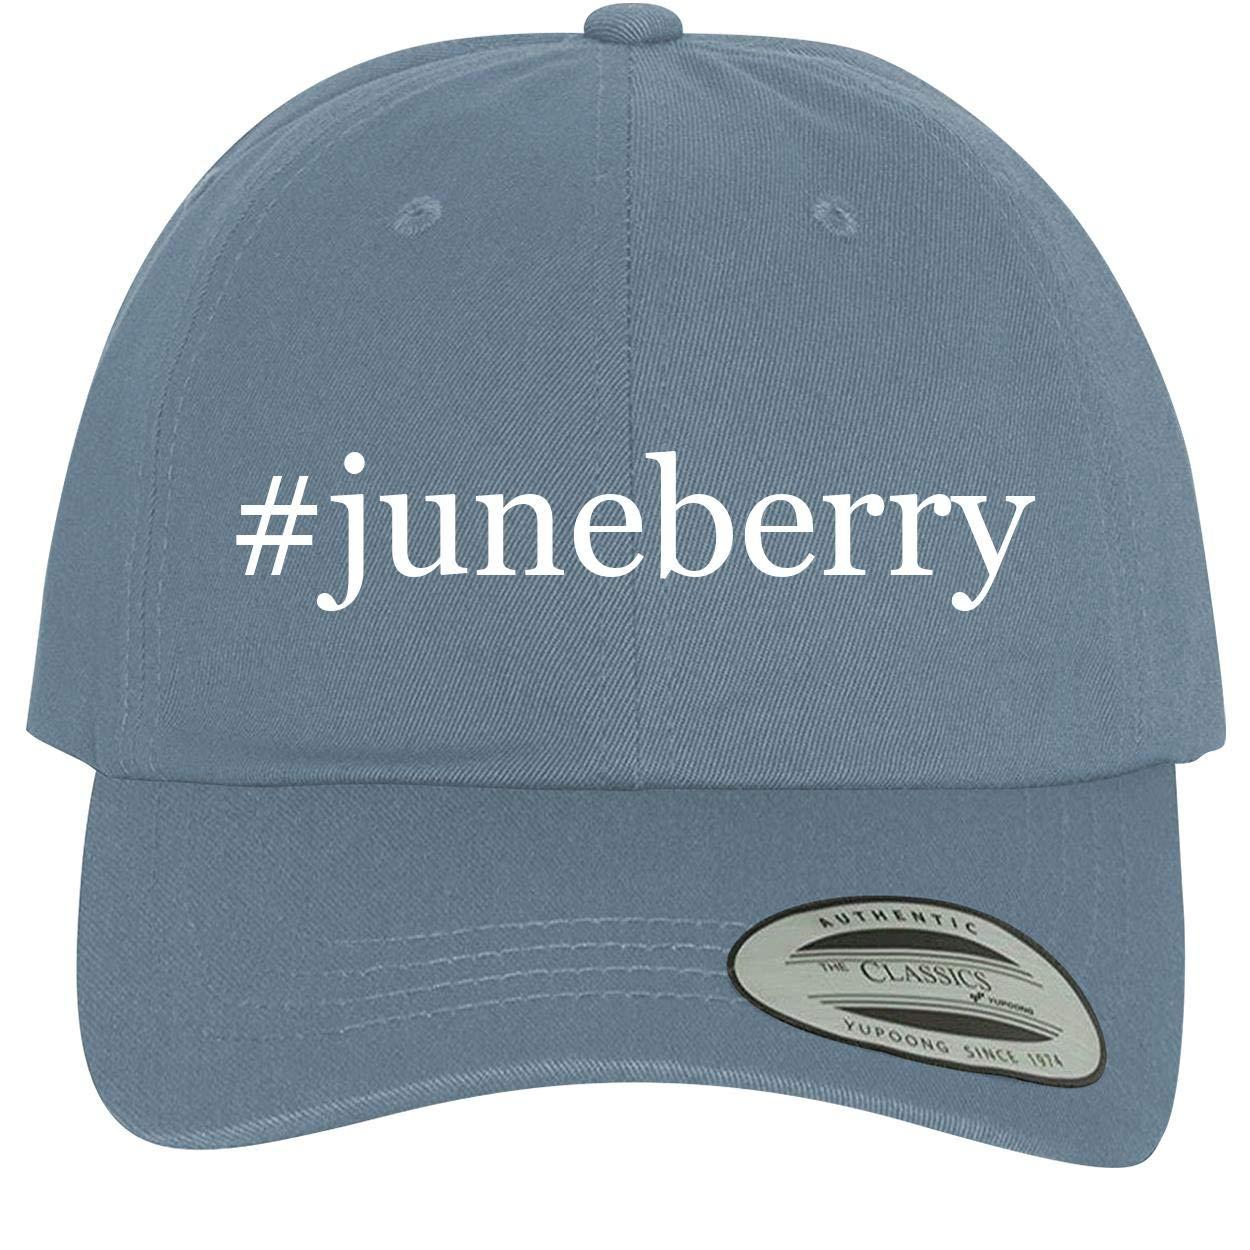 BH Cool Designs #juneberry Comfortable Dad Hat Baseball Cap